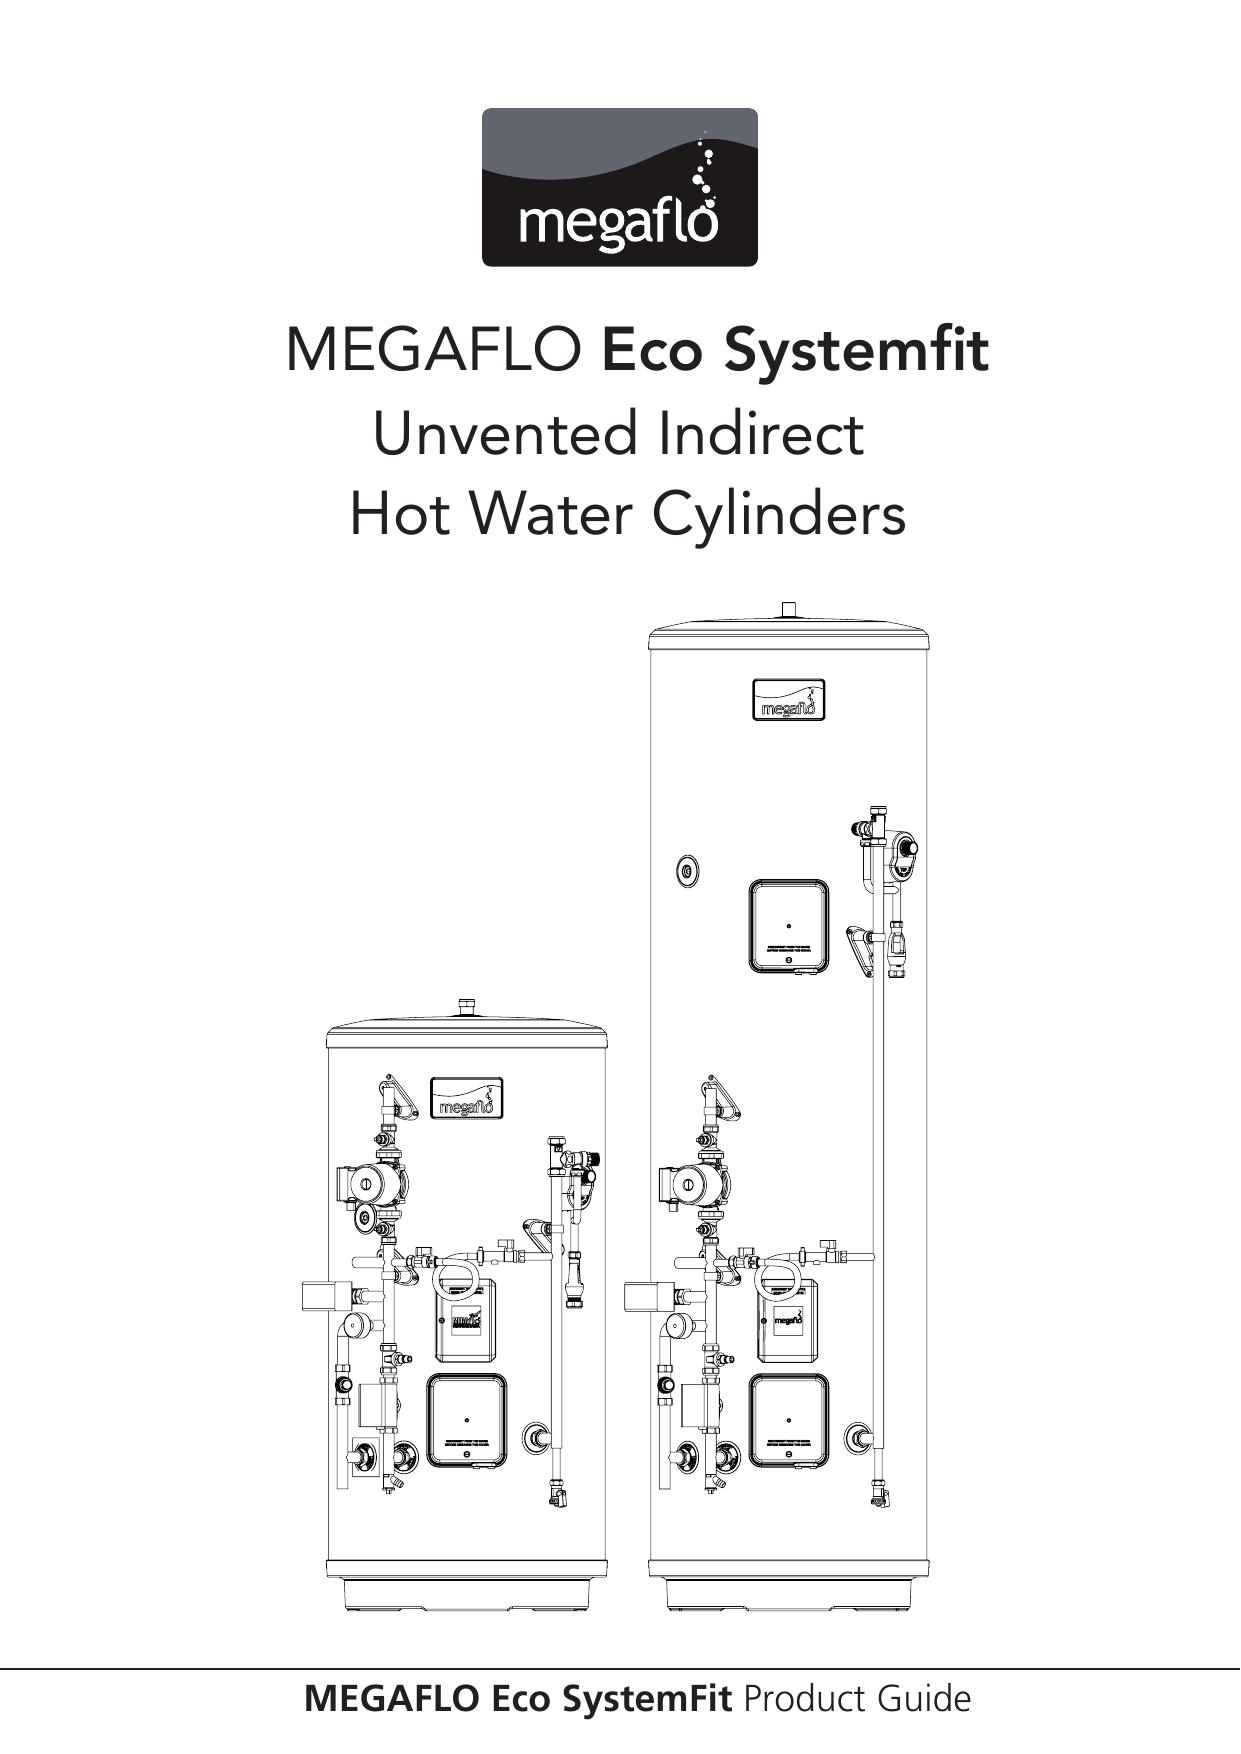 megaflo eco systemfit heatrae sadia manualzz com rh manualzz com